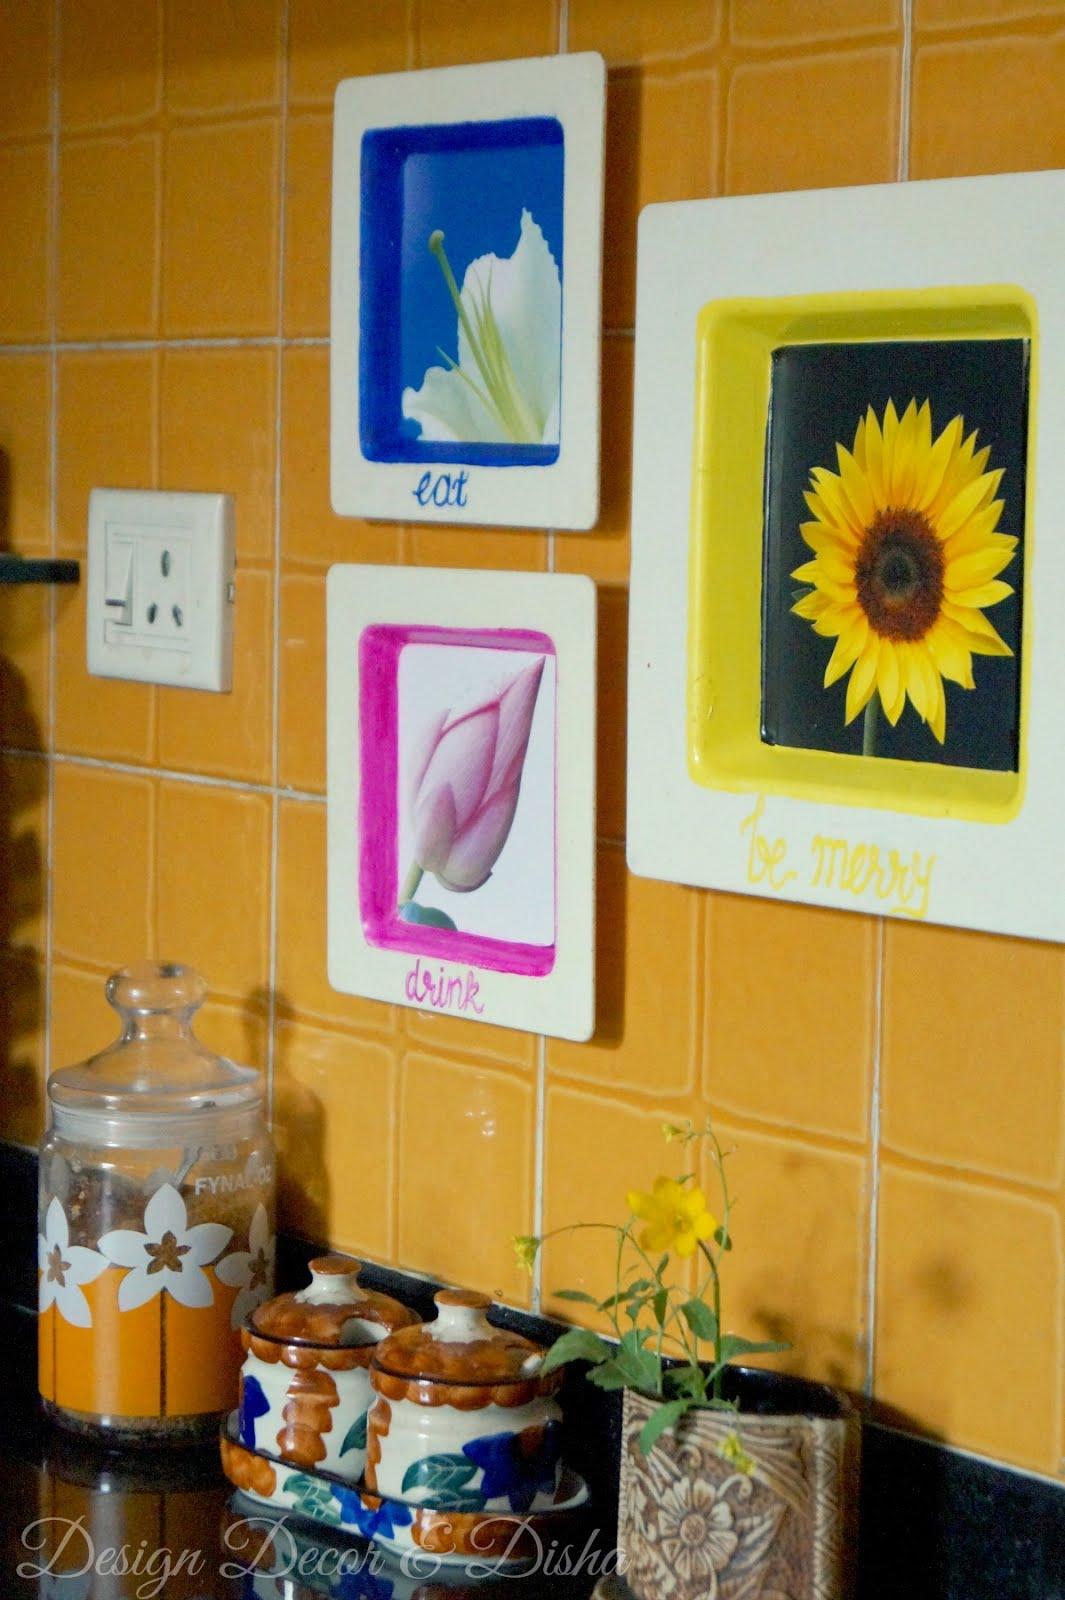 Kitchen Artwork Design Decor Disha Diy Kitchen Artwork